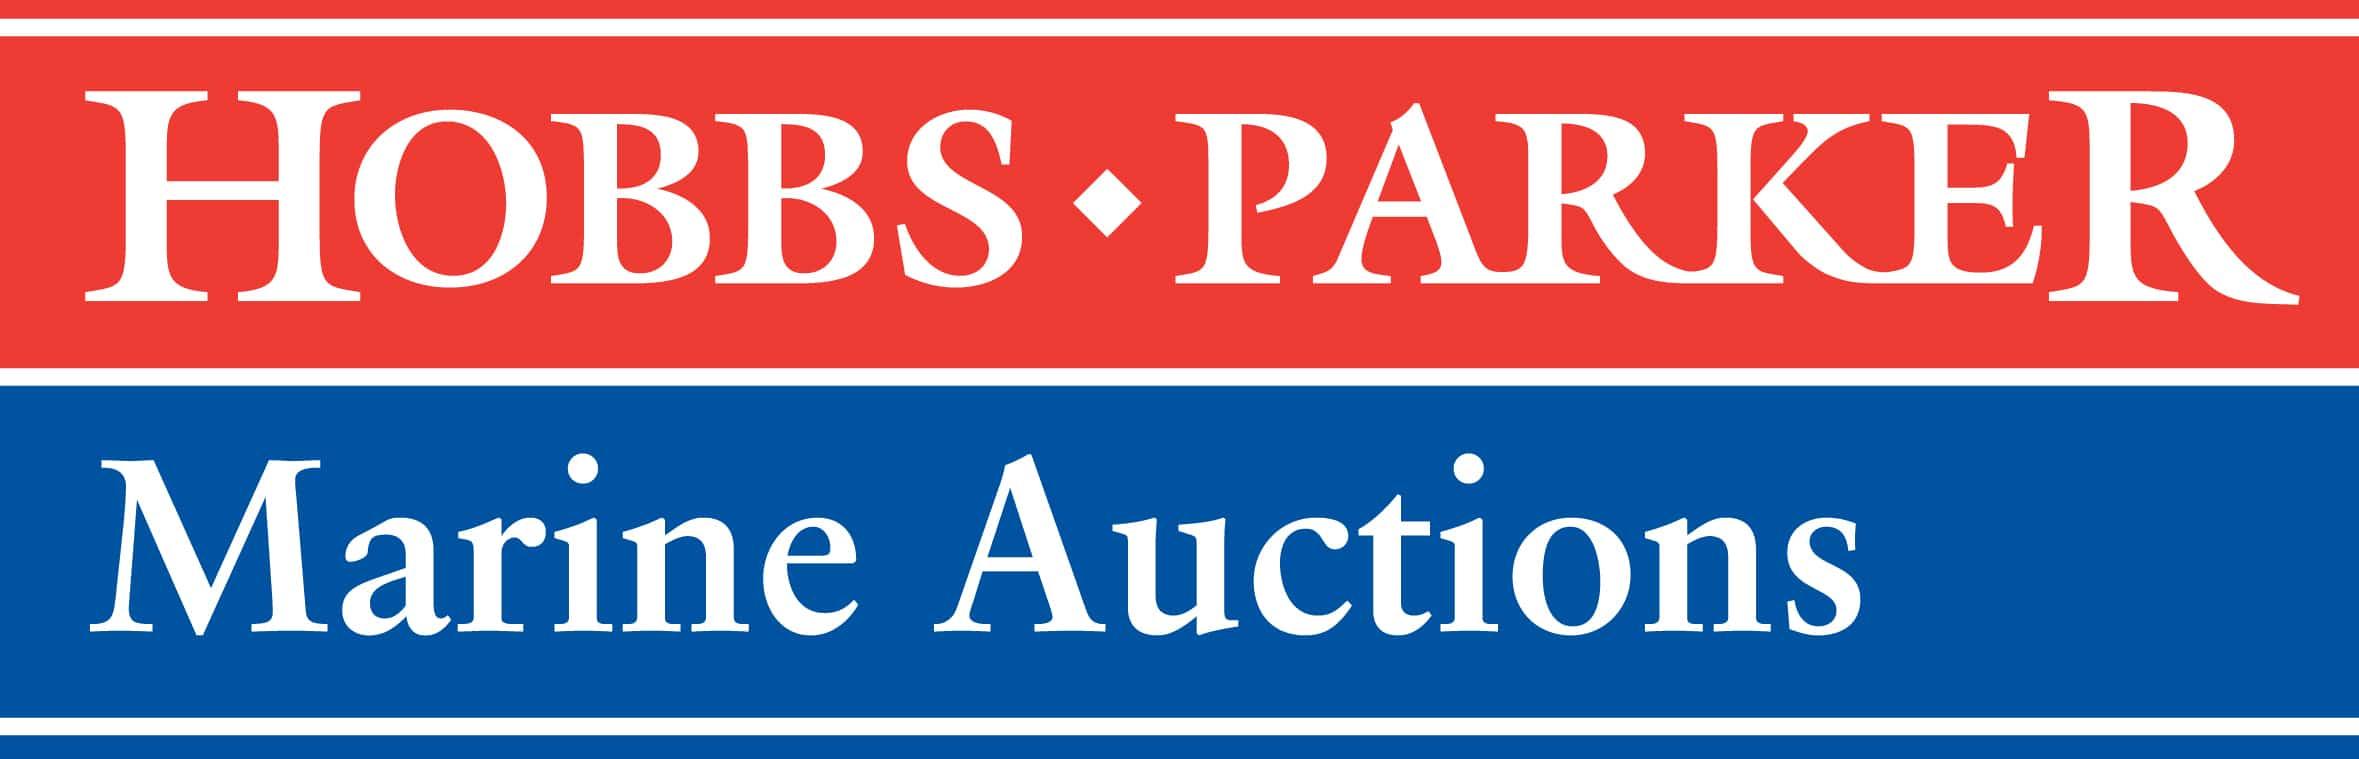 Marine Auctions